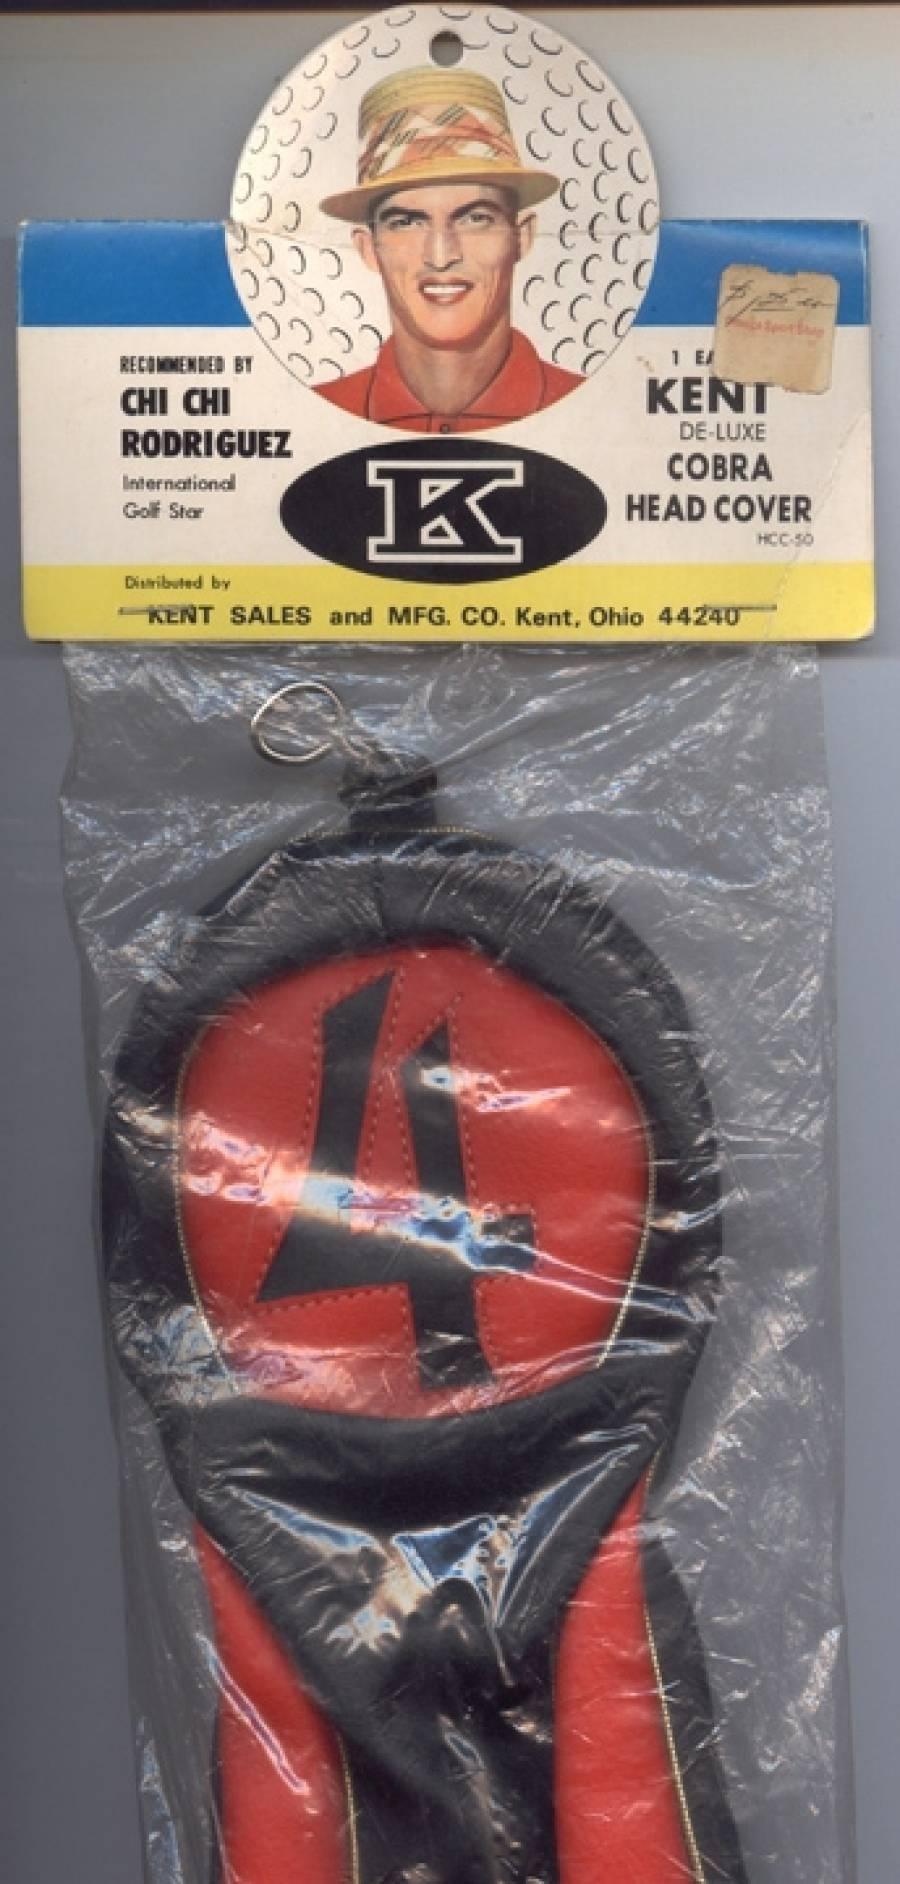 Original Chi-Chi Packaging Inspiration